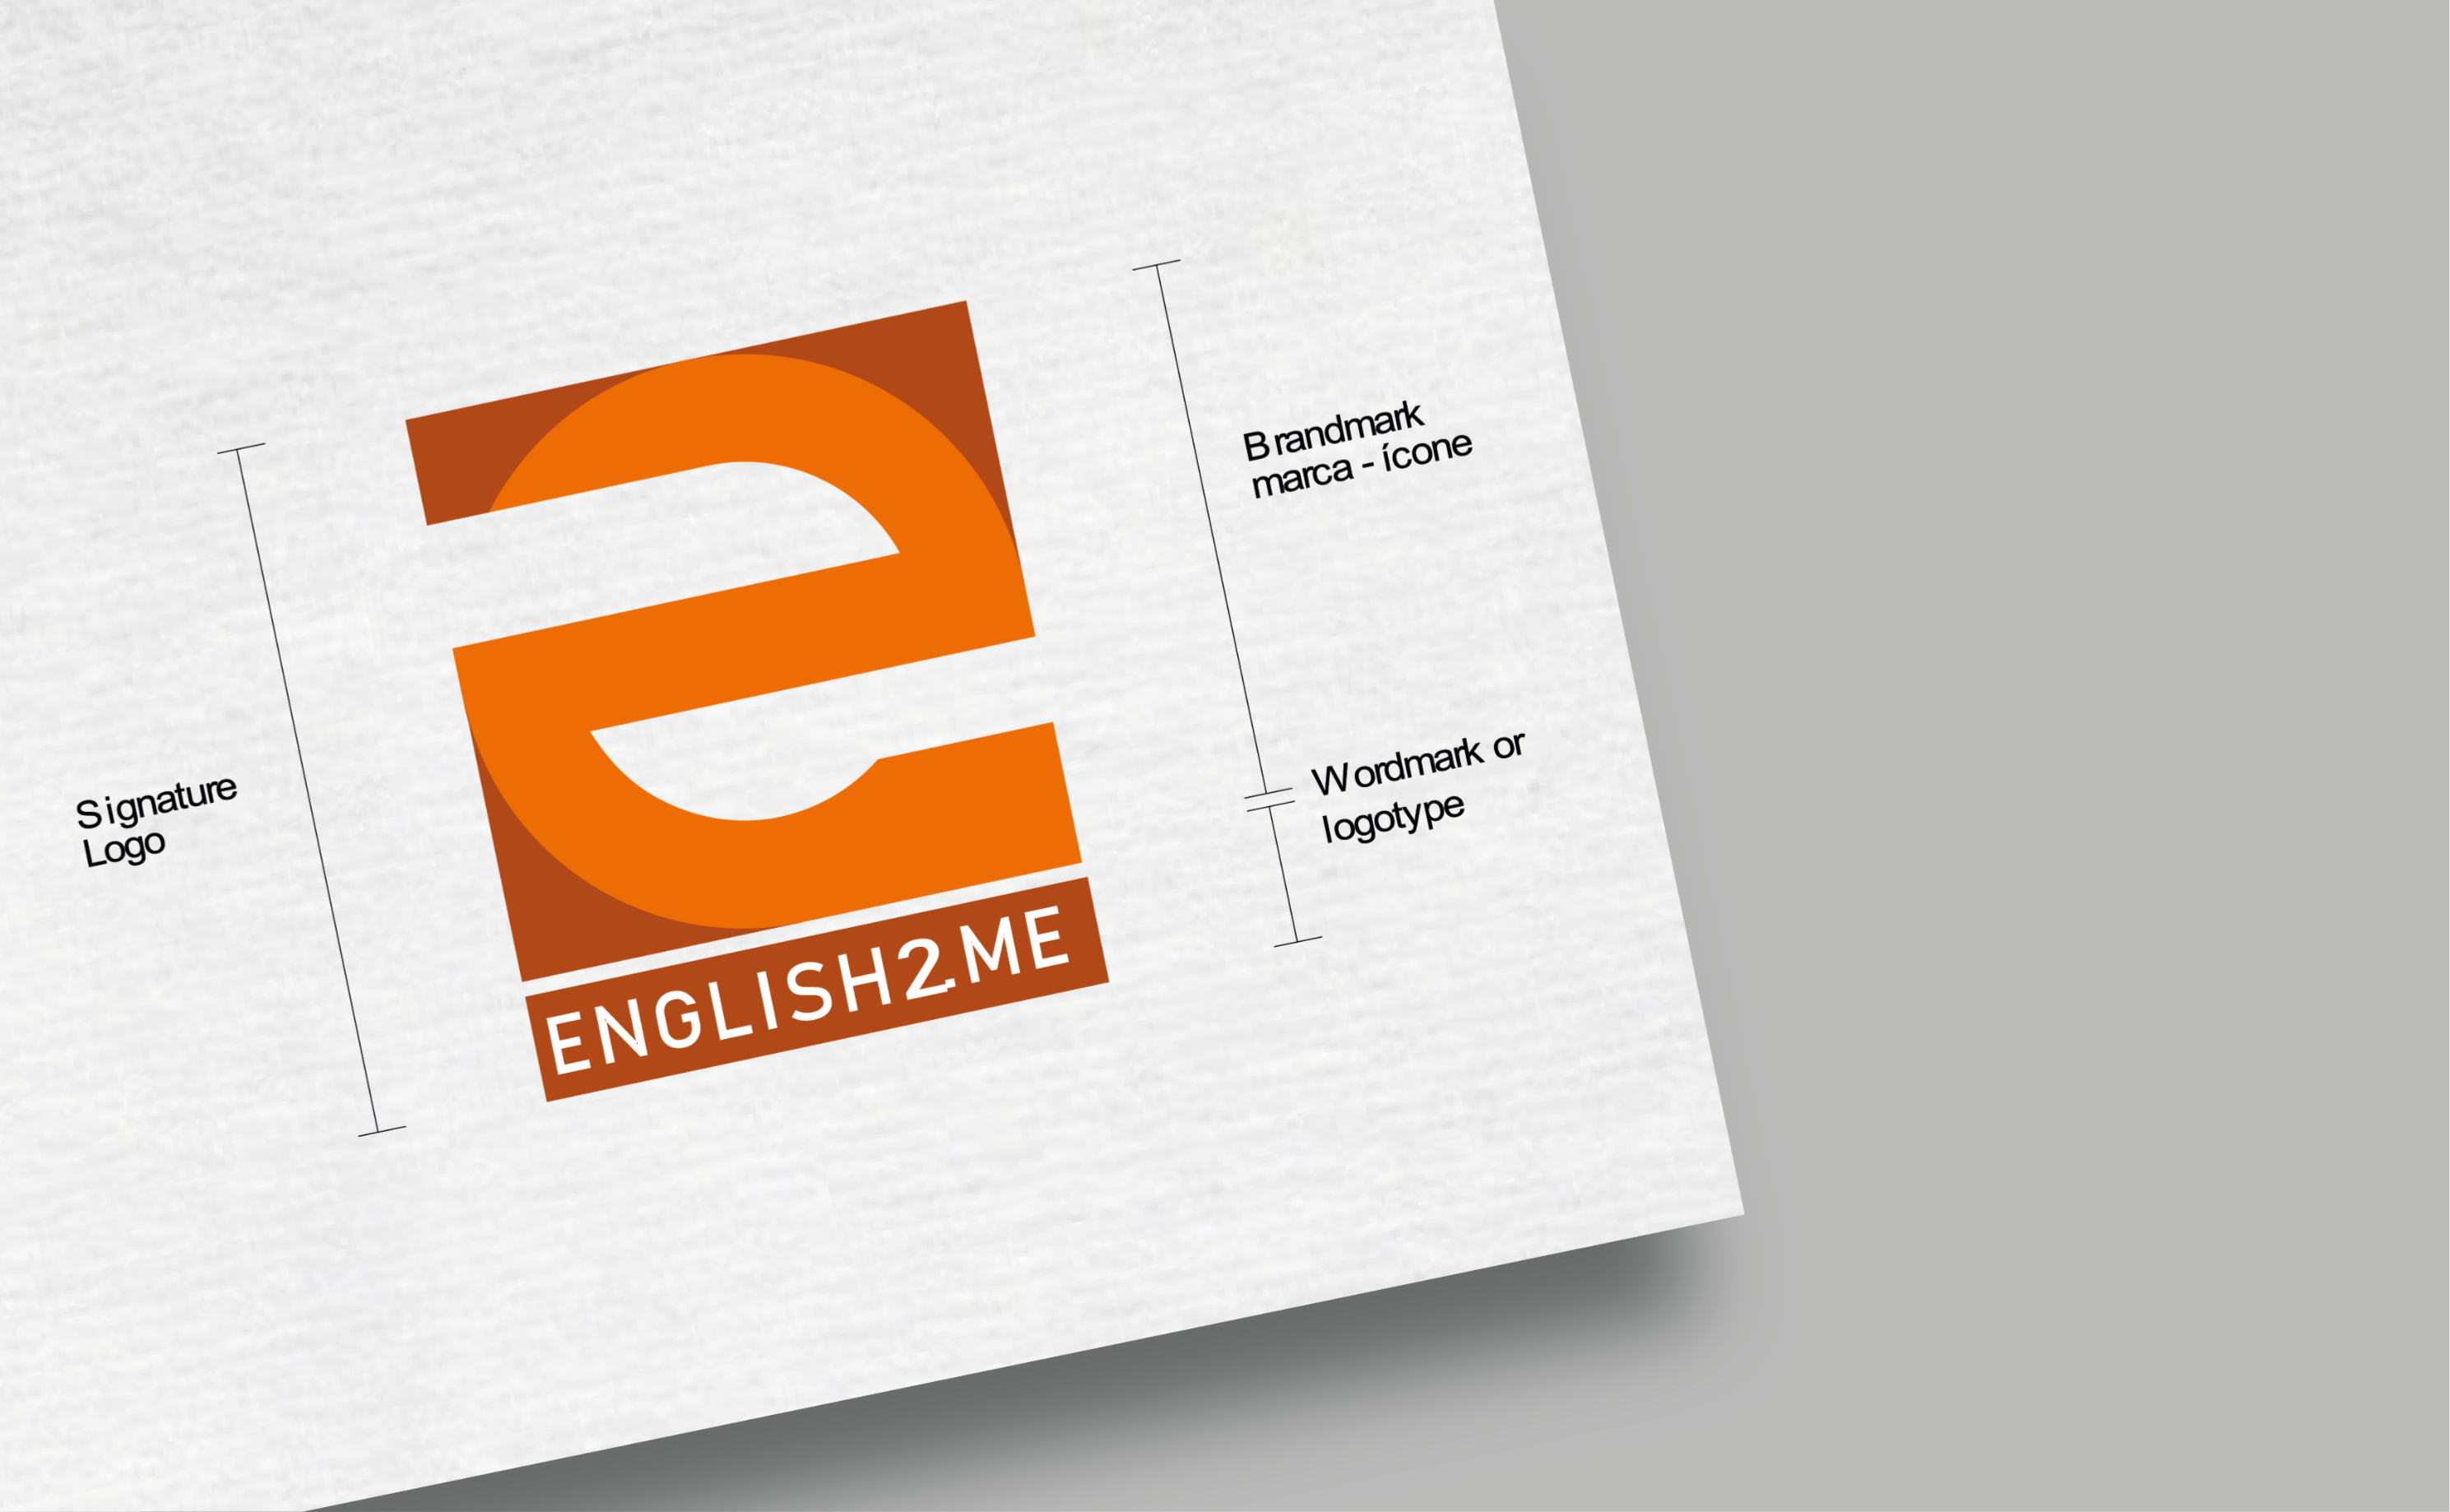 English to Me-02-02_edited